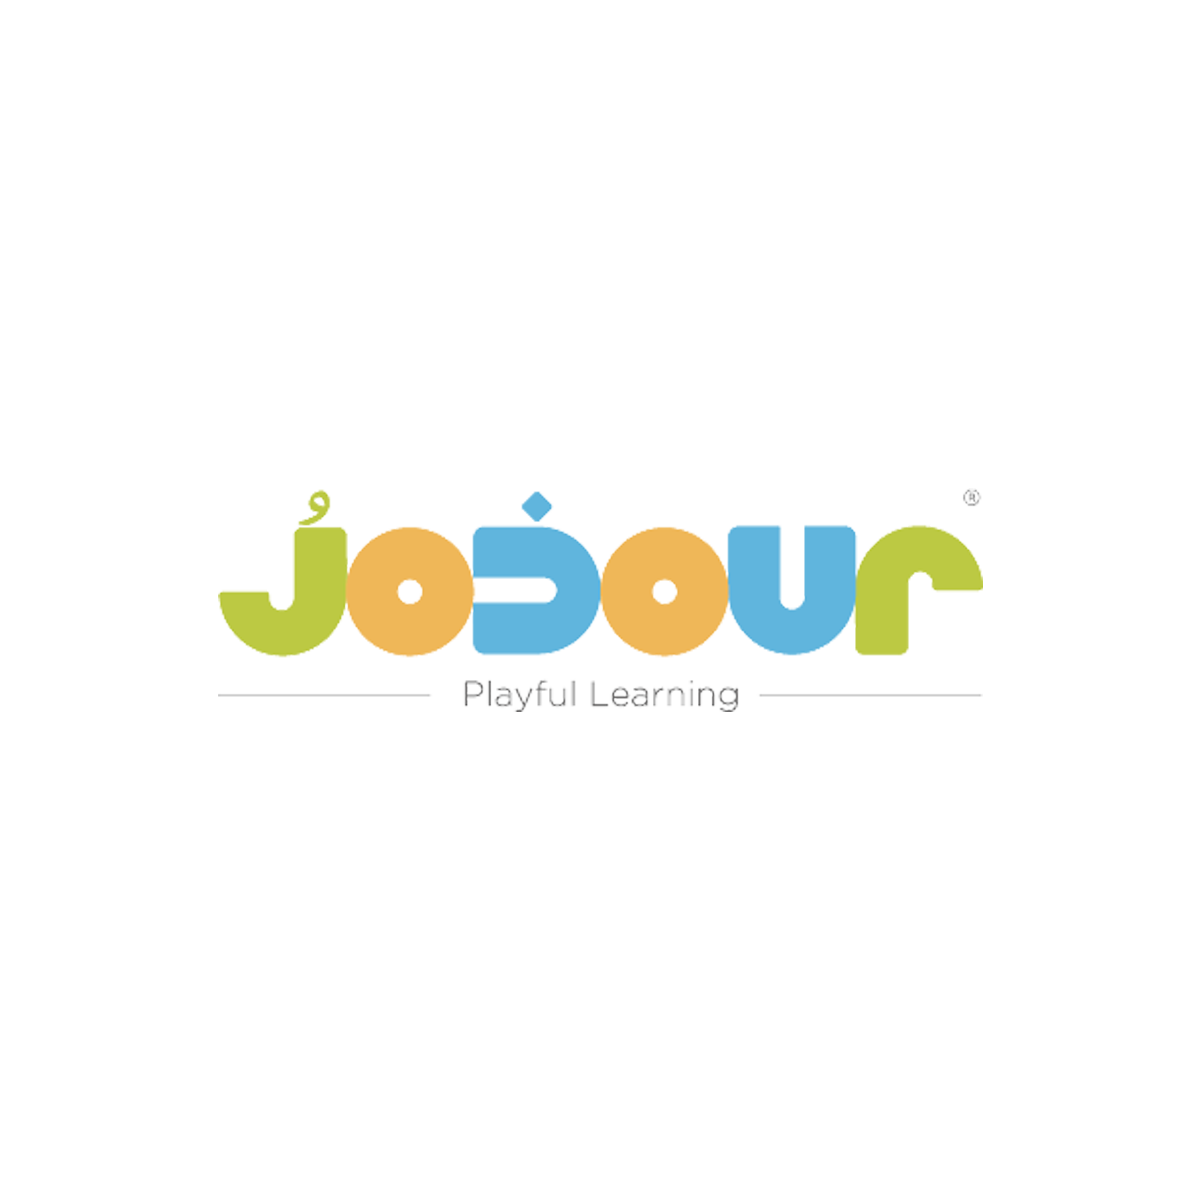 Jodour